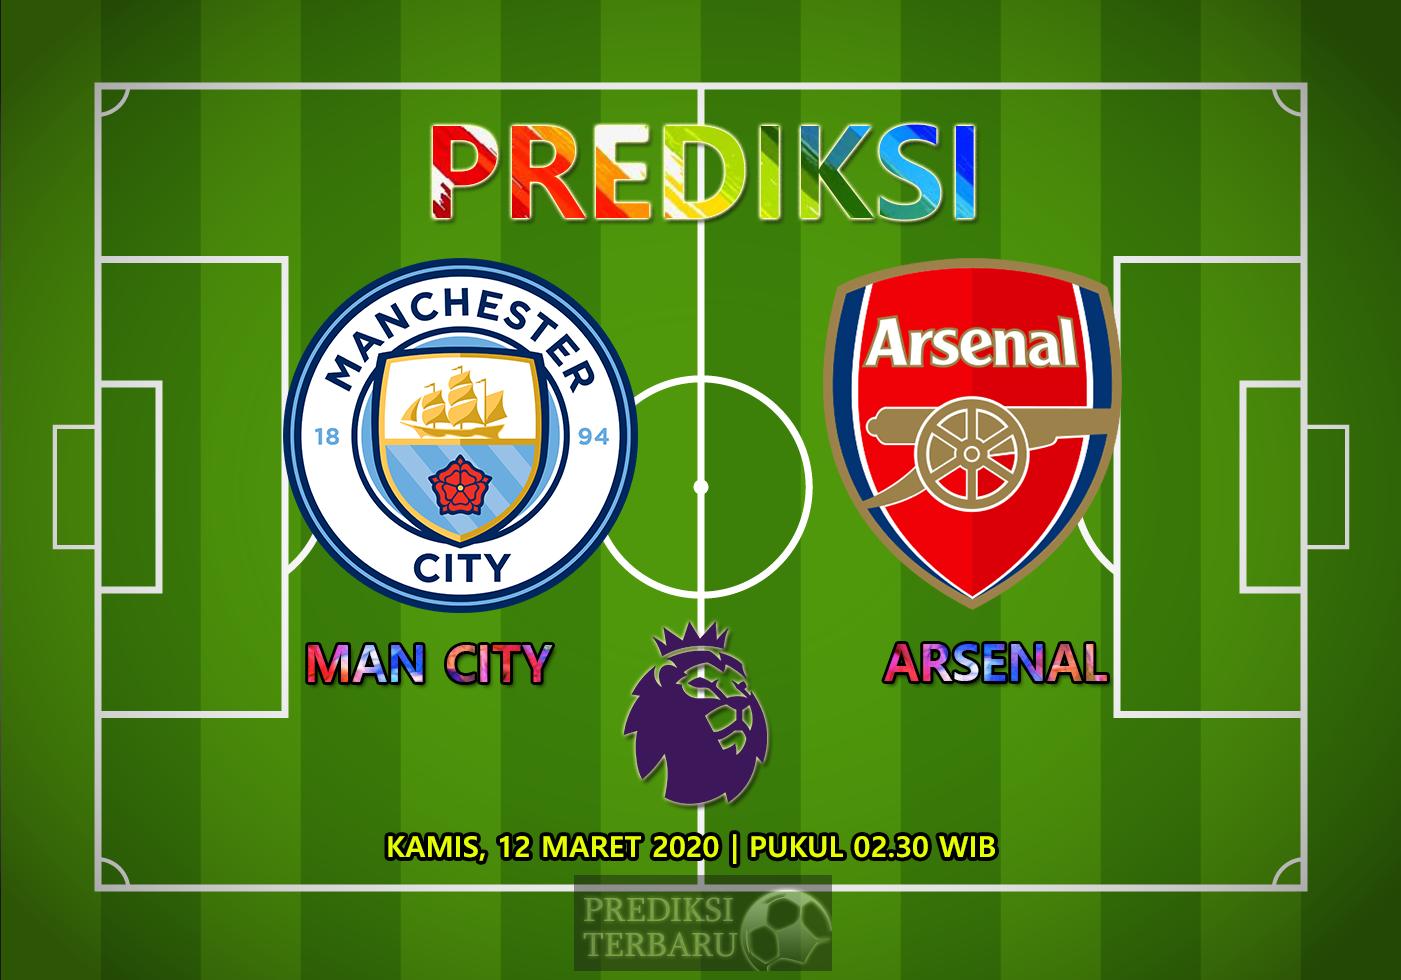 Prediksi Manchester City Vs Arsenal Kamis 12 Maret